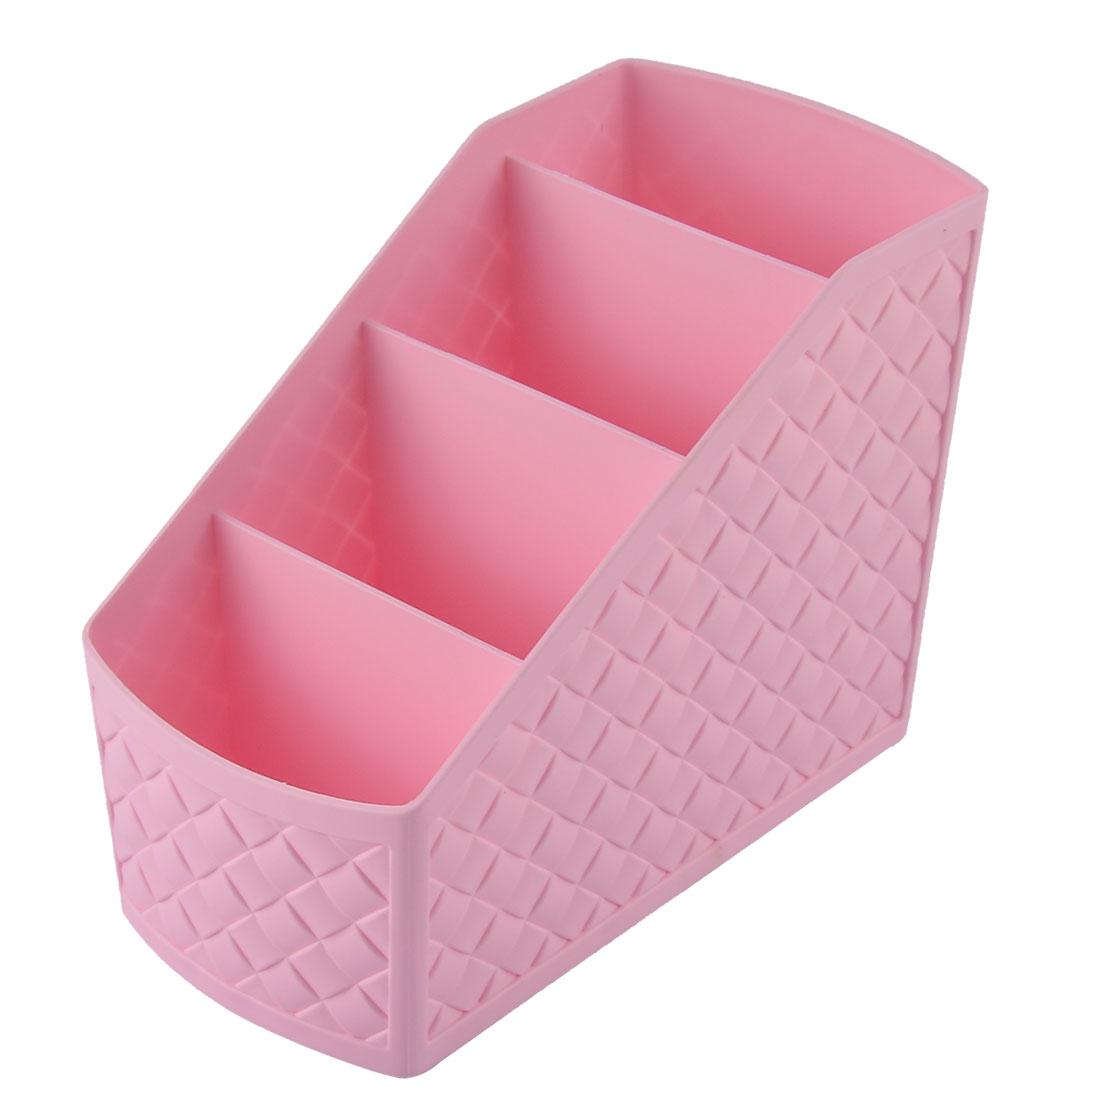 Imitation Rattan Design Home Cosmetic Desktop Storage Divider Container Box Cyan